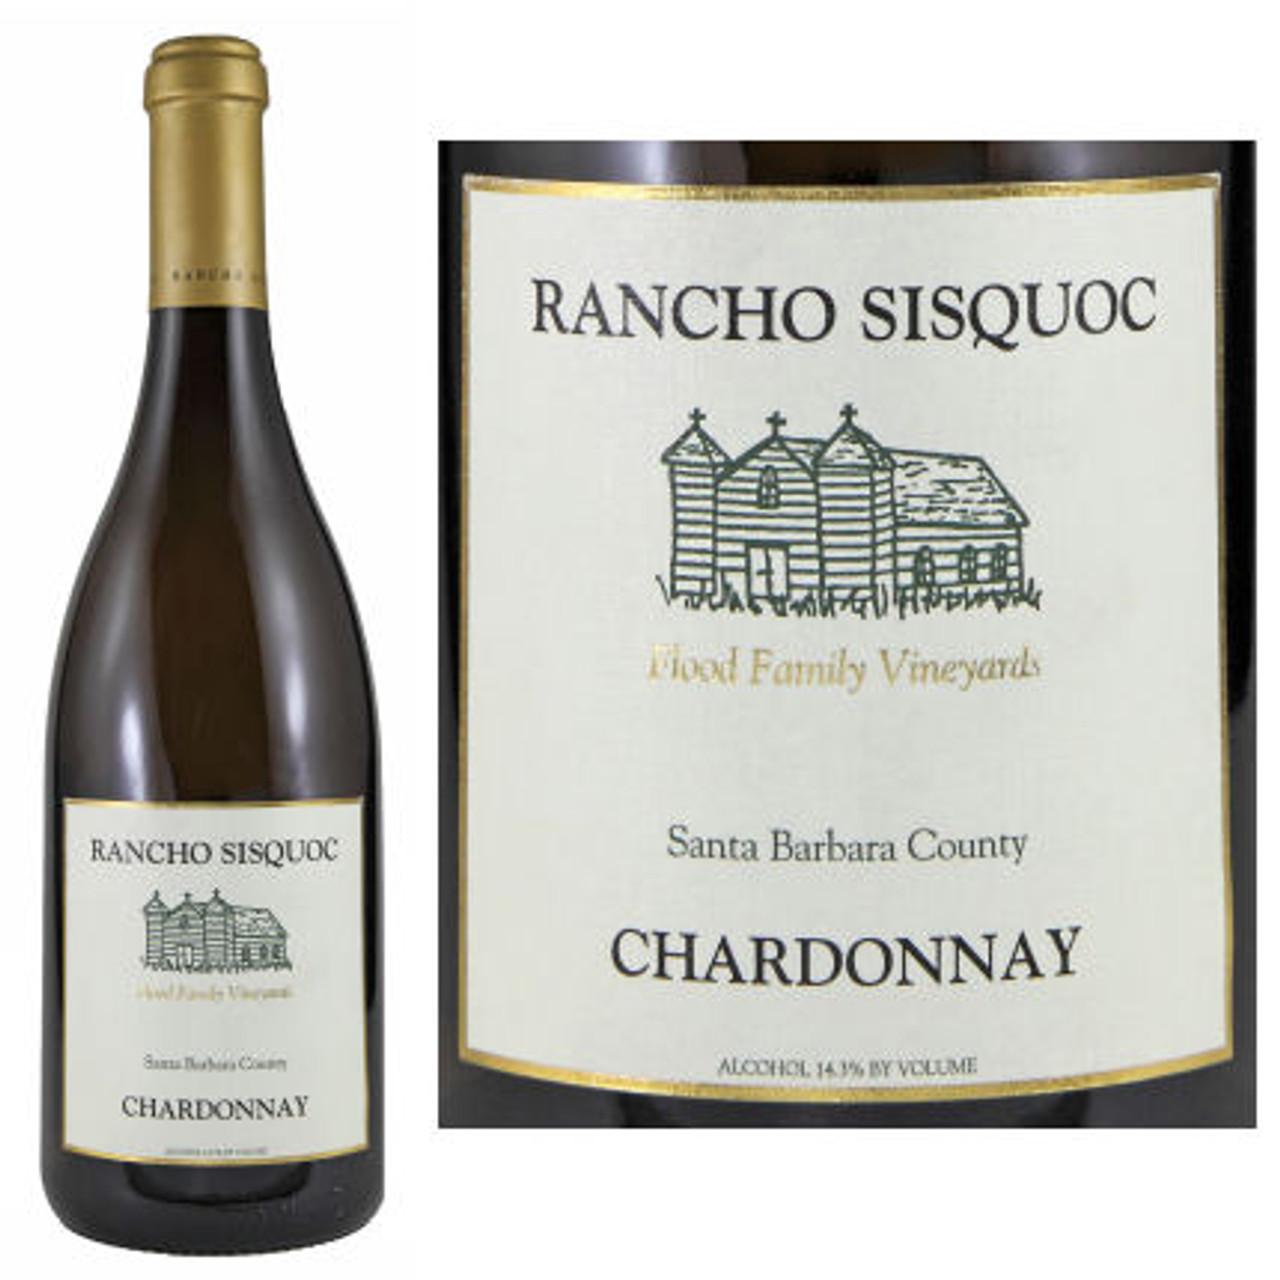 Rancho Sisquoc Santa Barbara Chardonnay